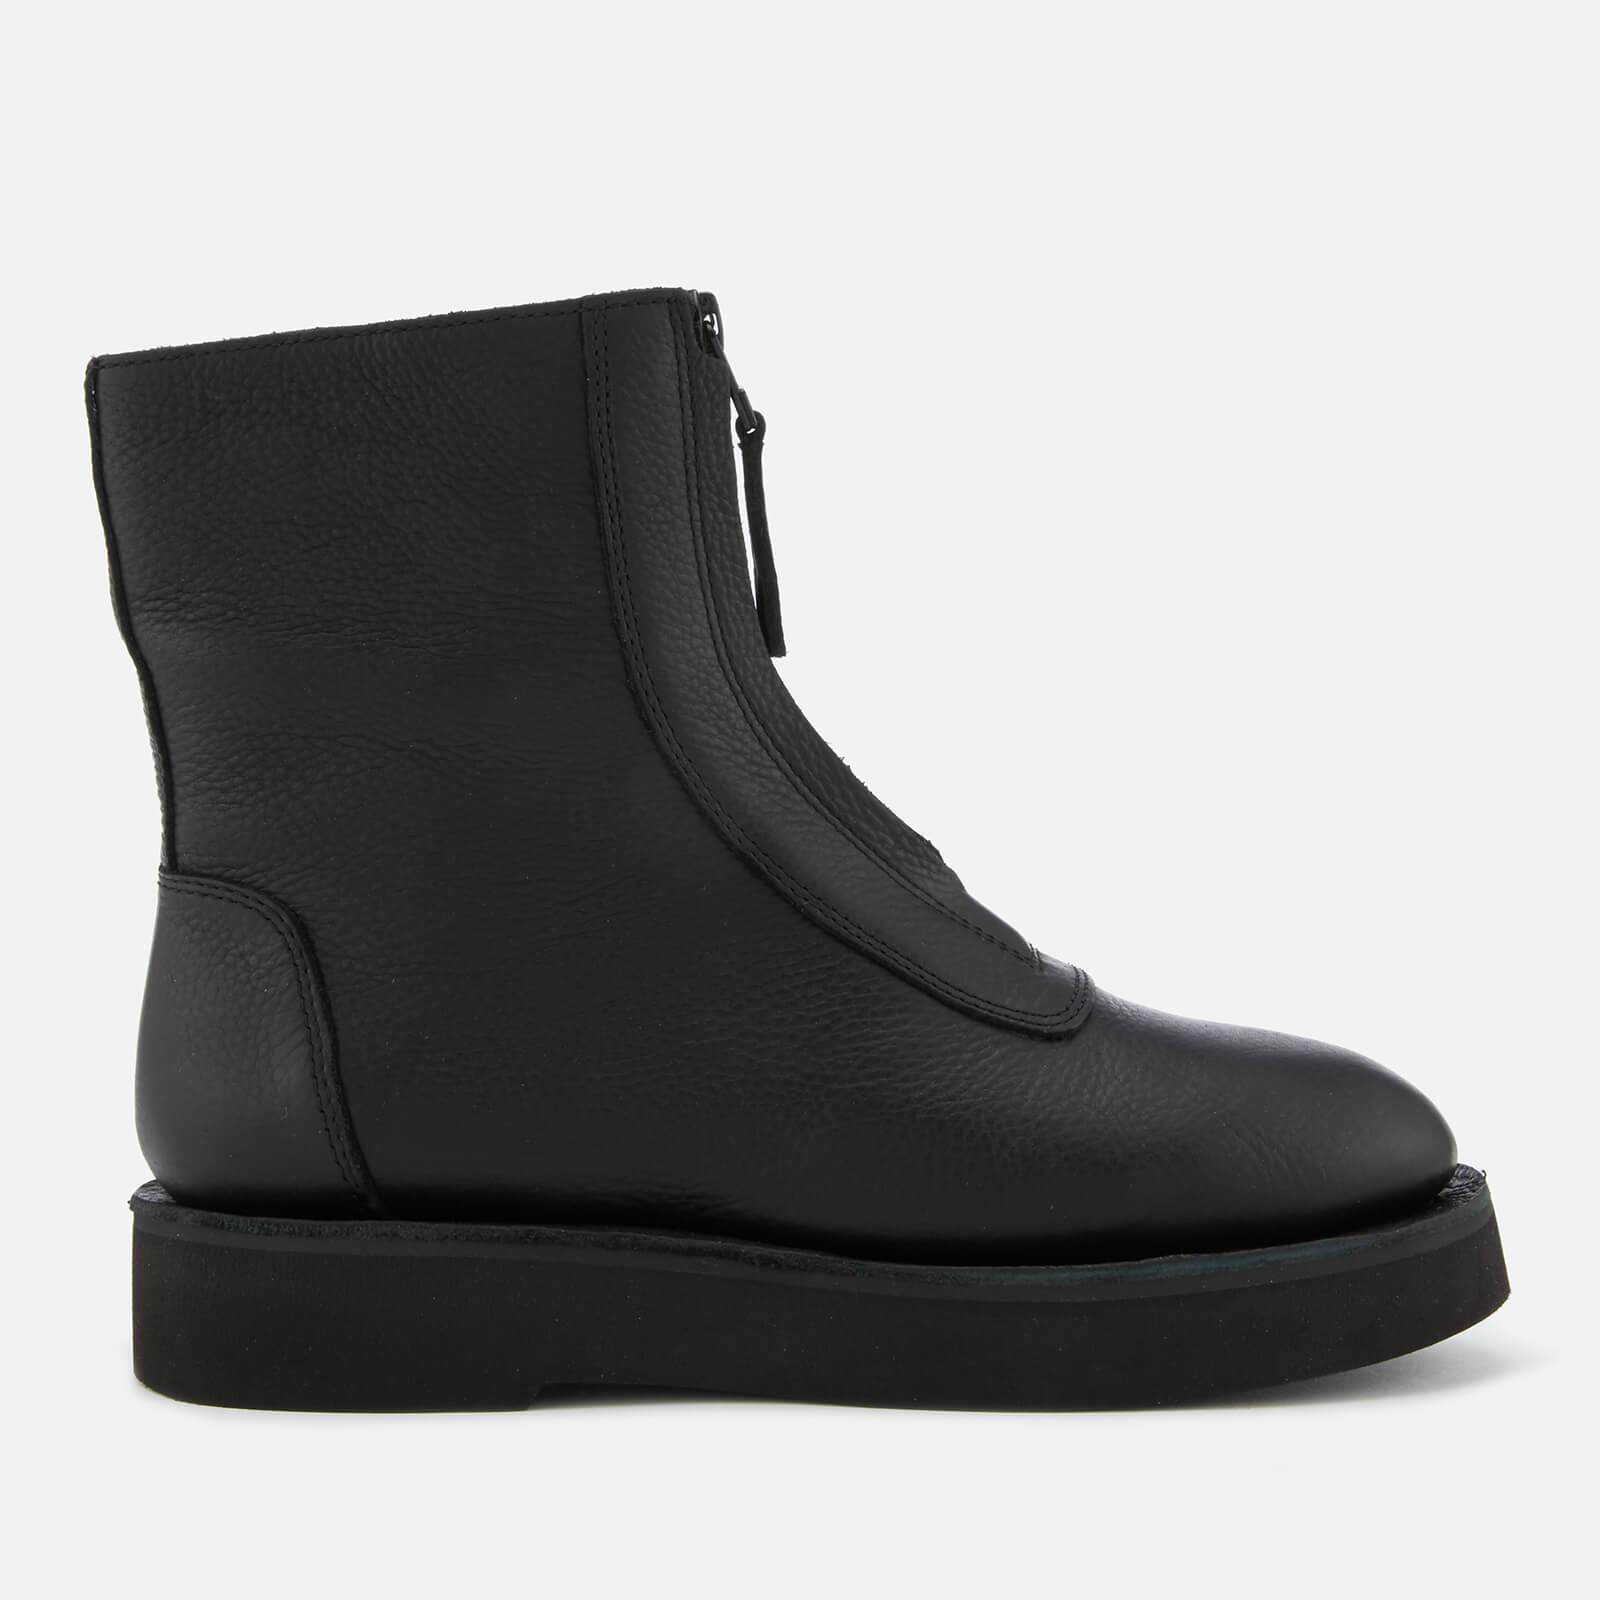 359e1f3c8139 Camper Women s Platform Ankle Boots - Black